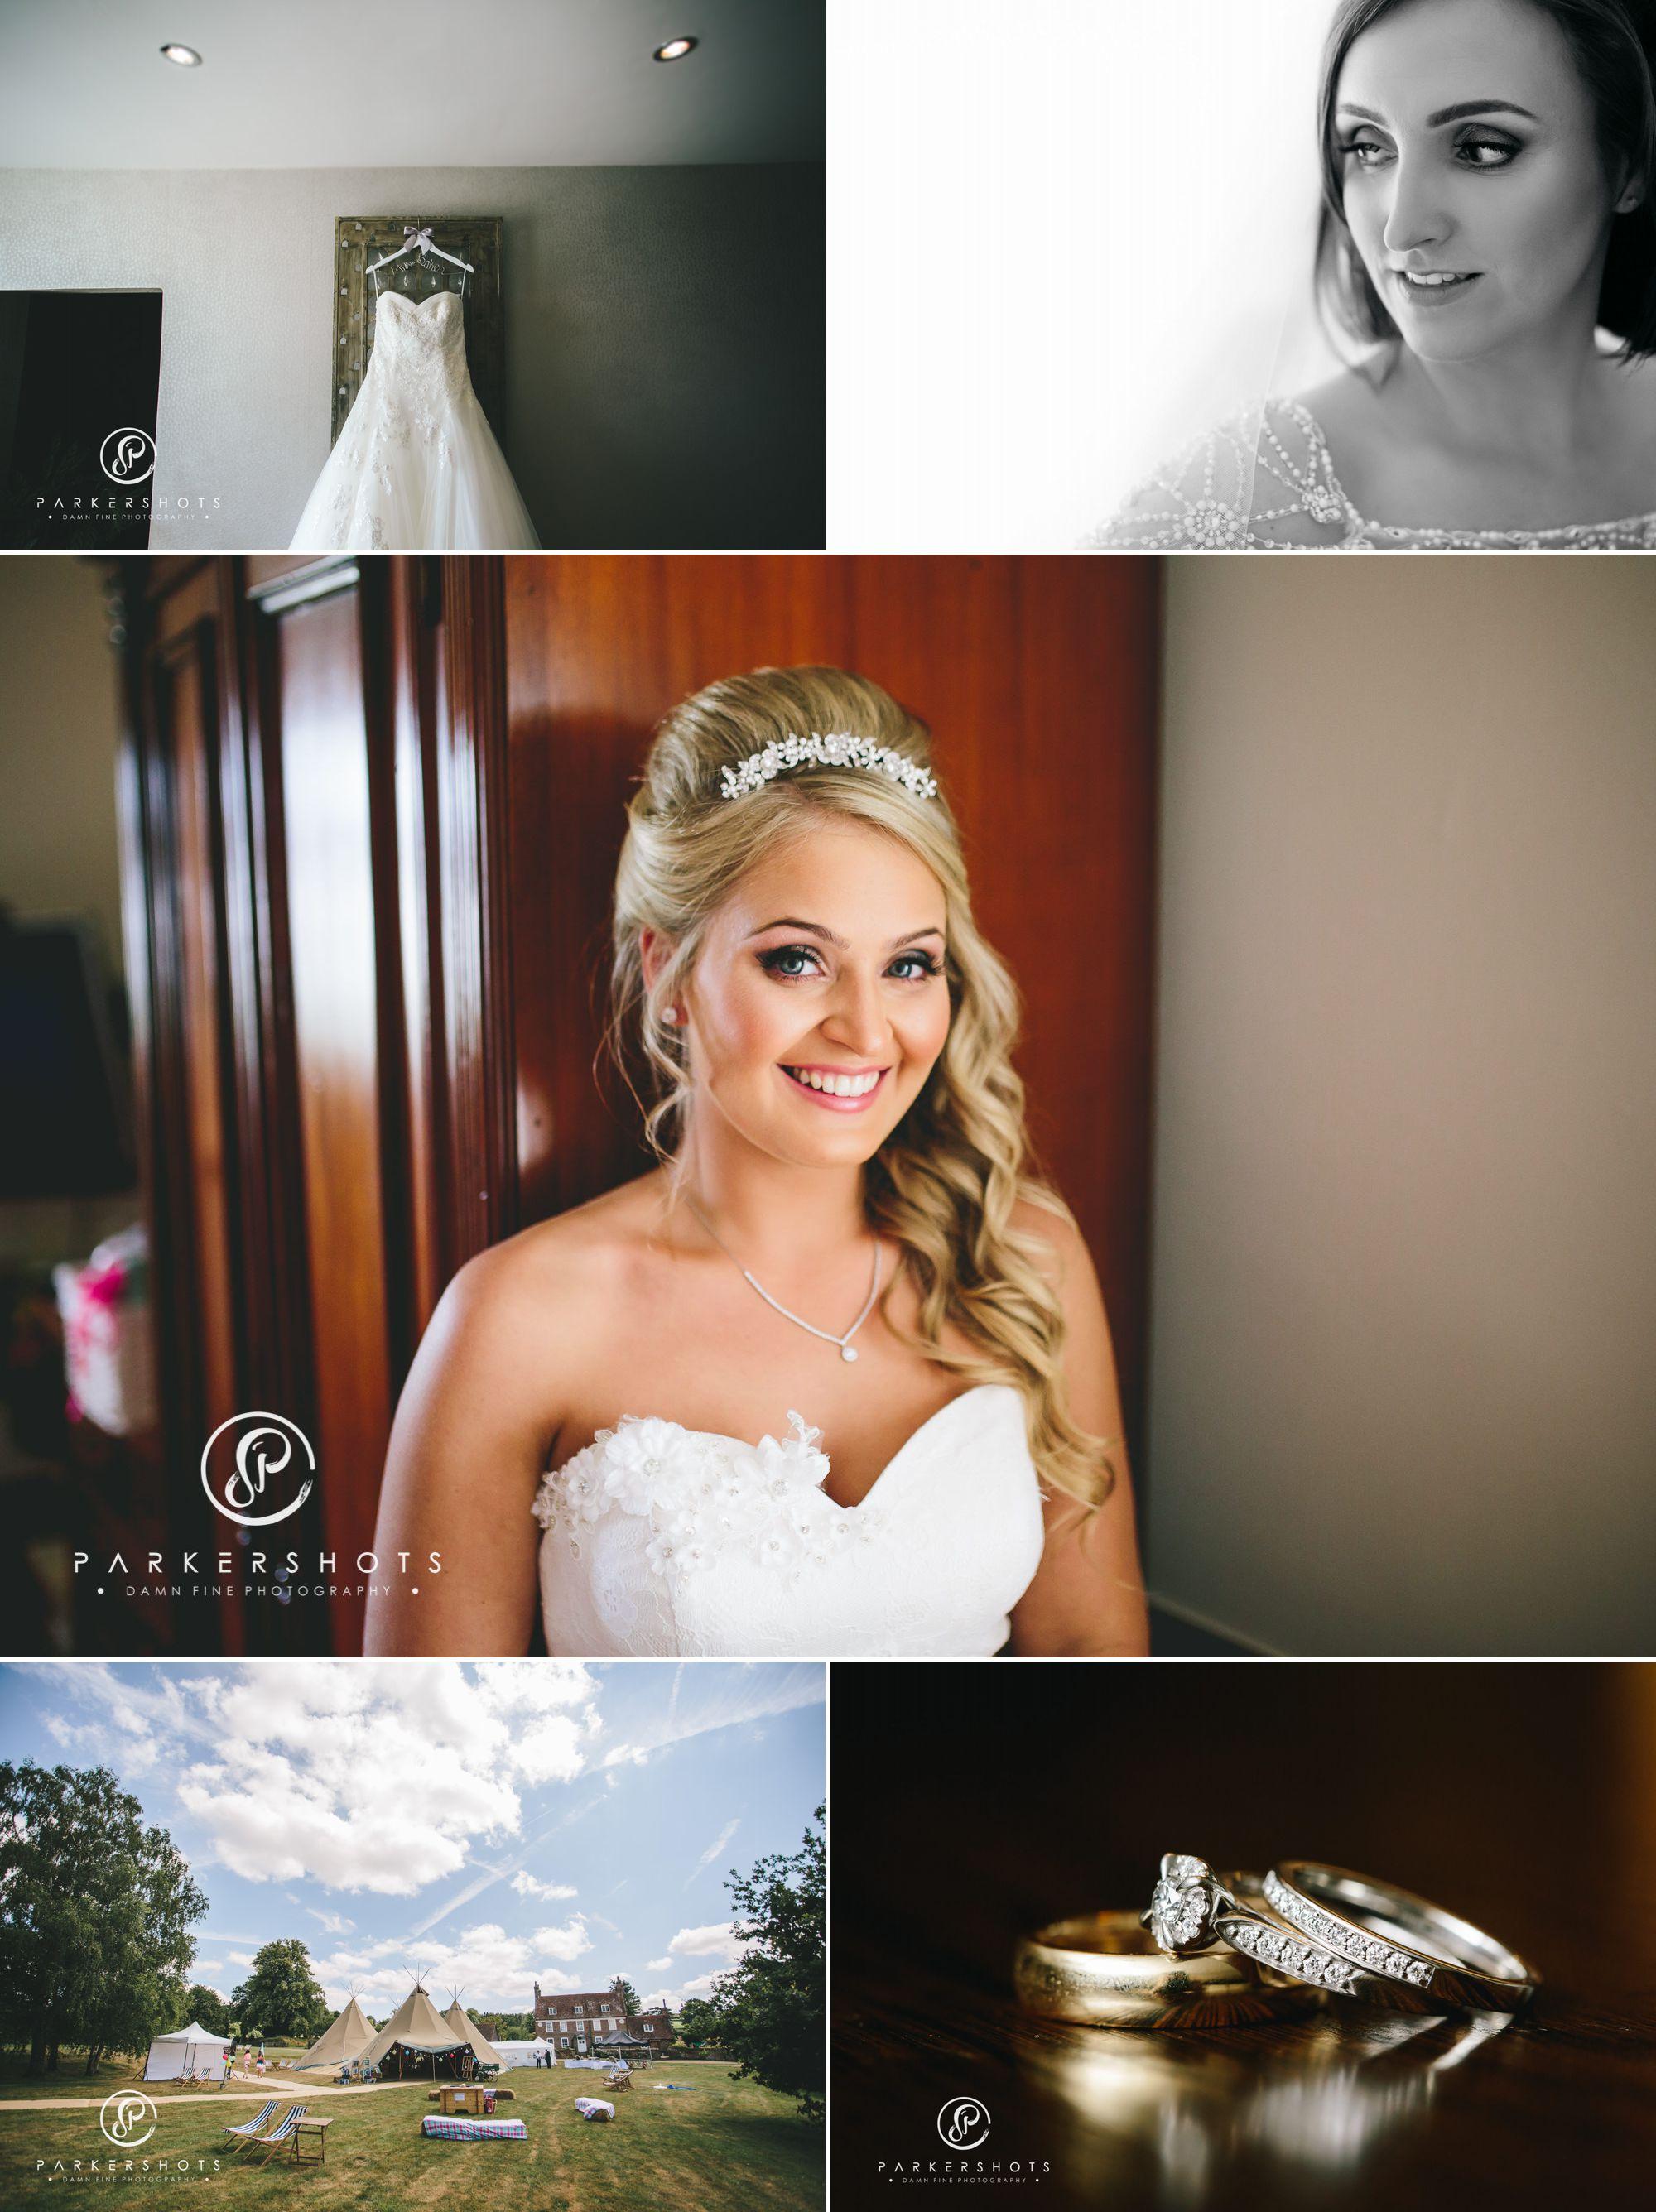 Best_Of_Wedding_Photographer_2015 15